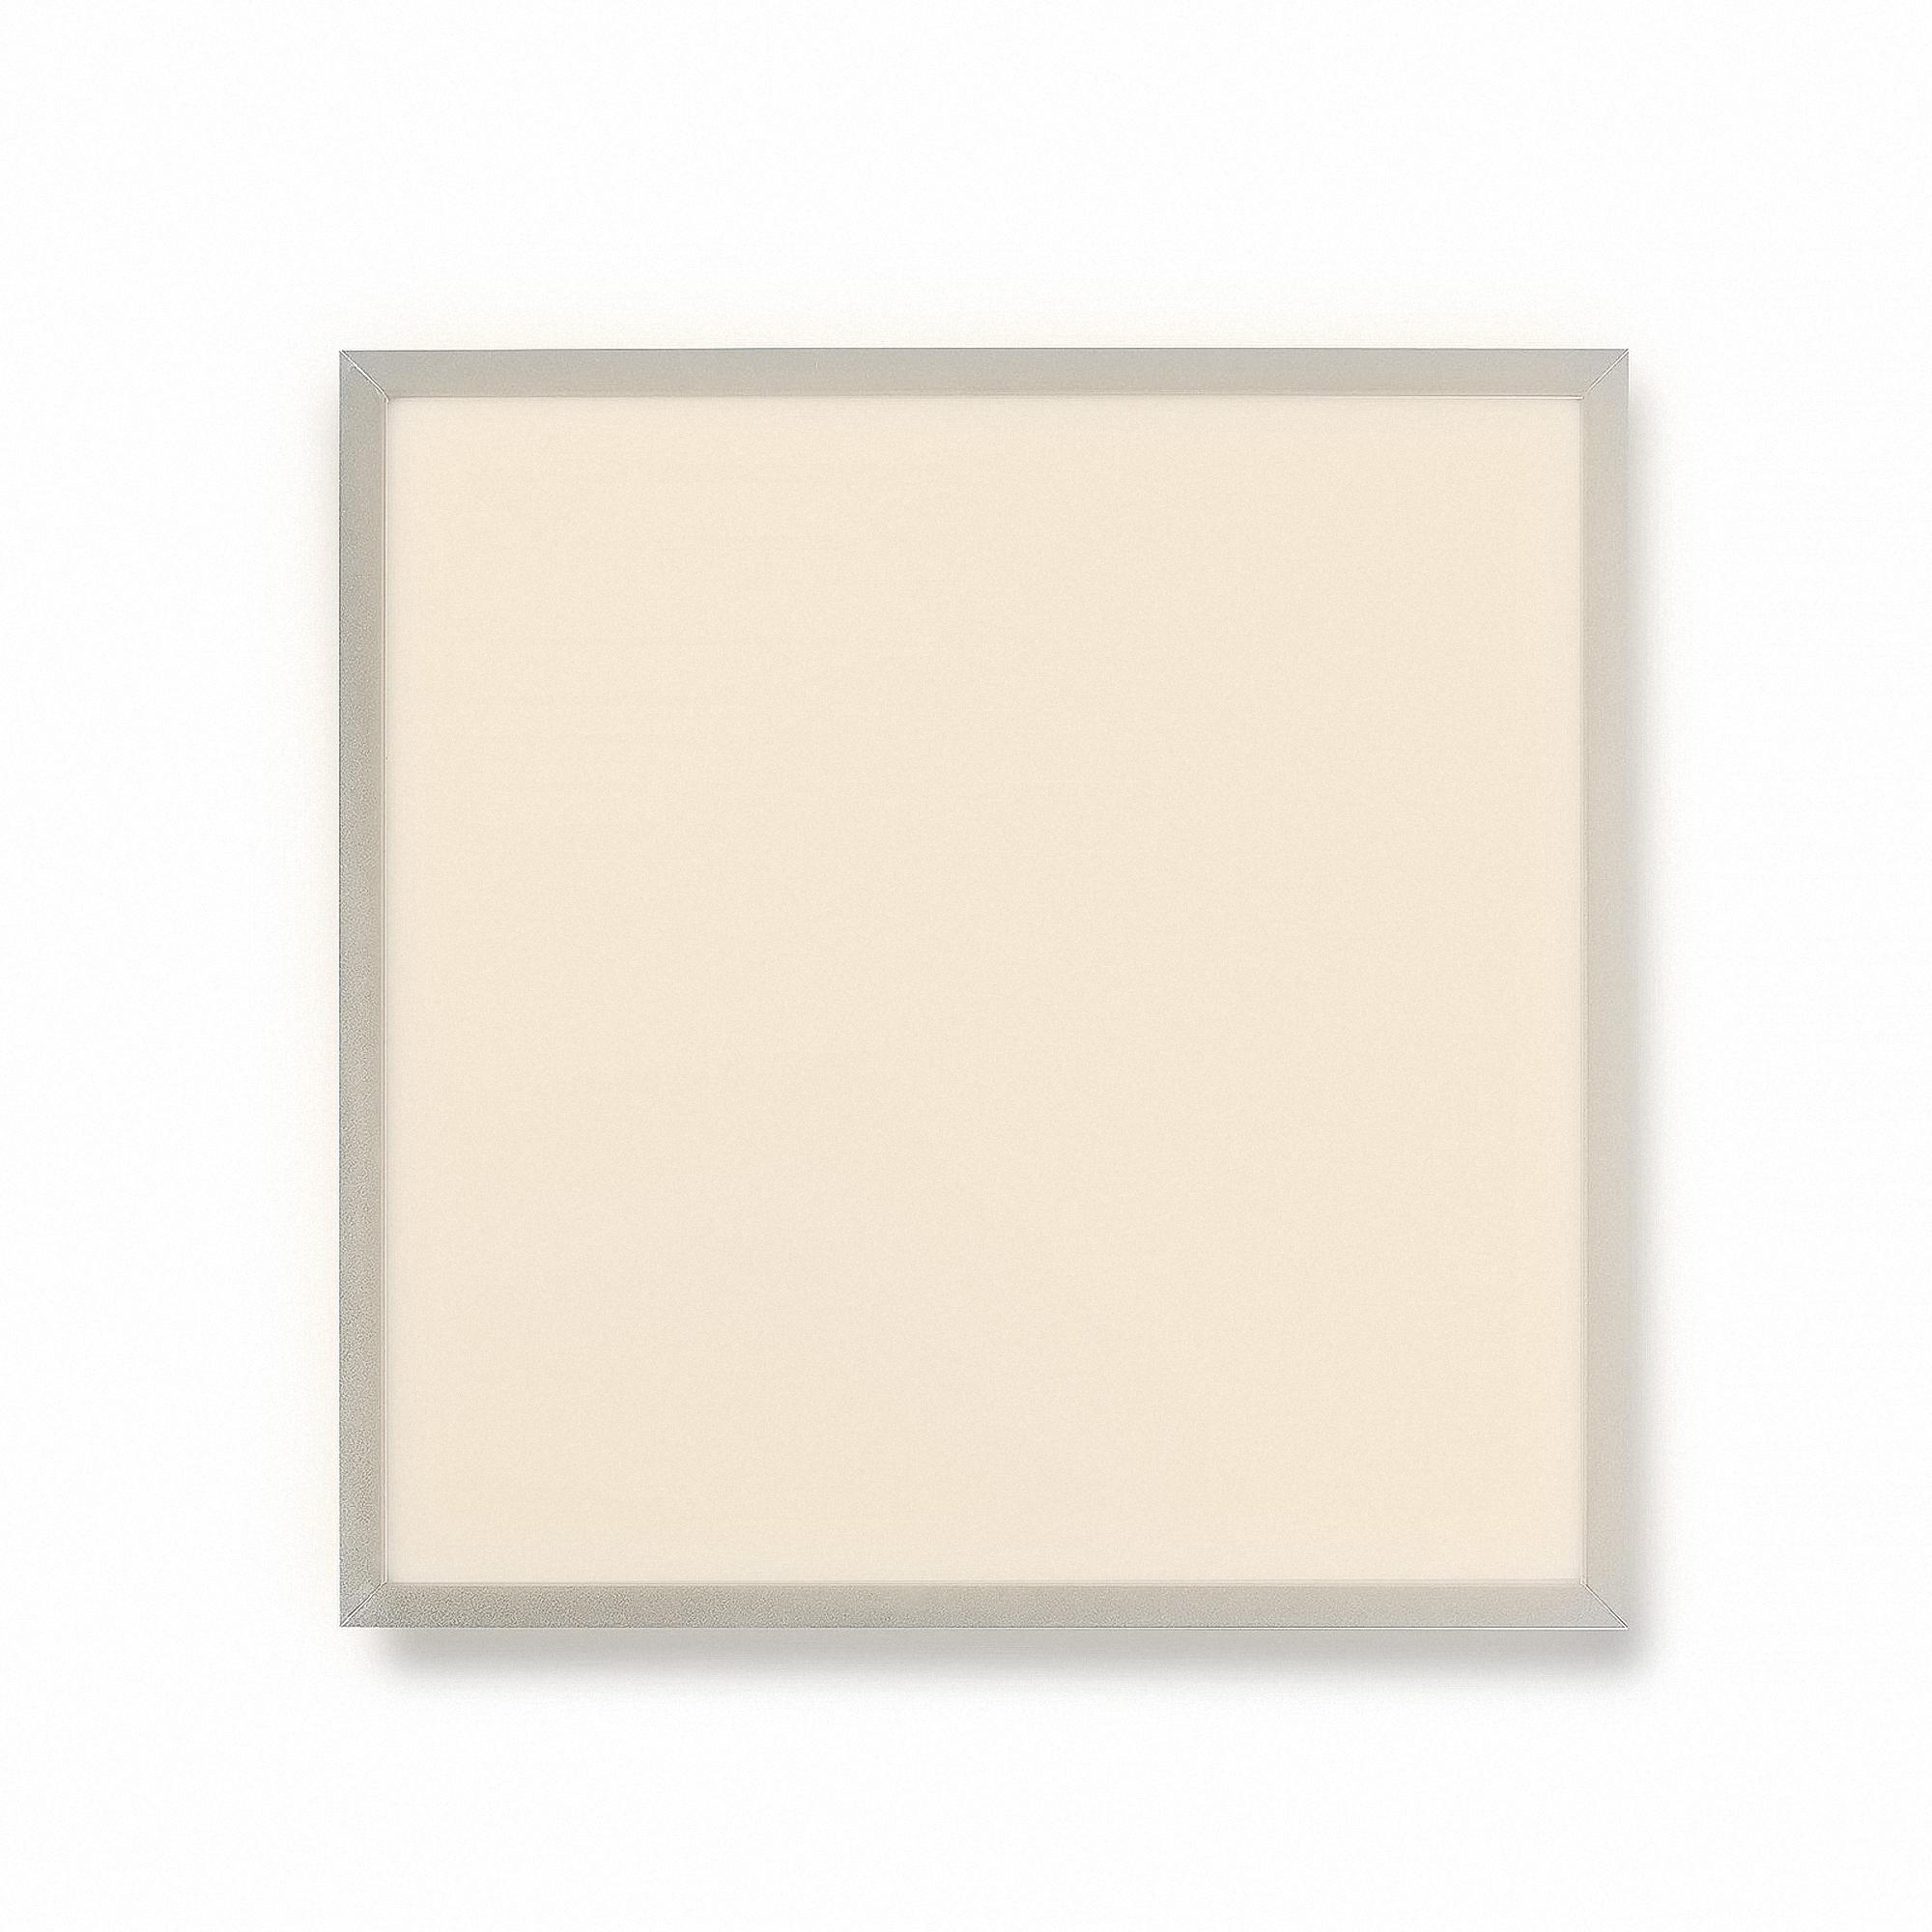 S LED Einlegepanel 62x62 80W 830 Warmweiß Dimmbar